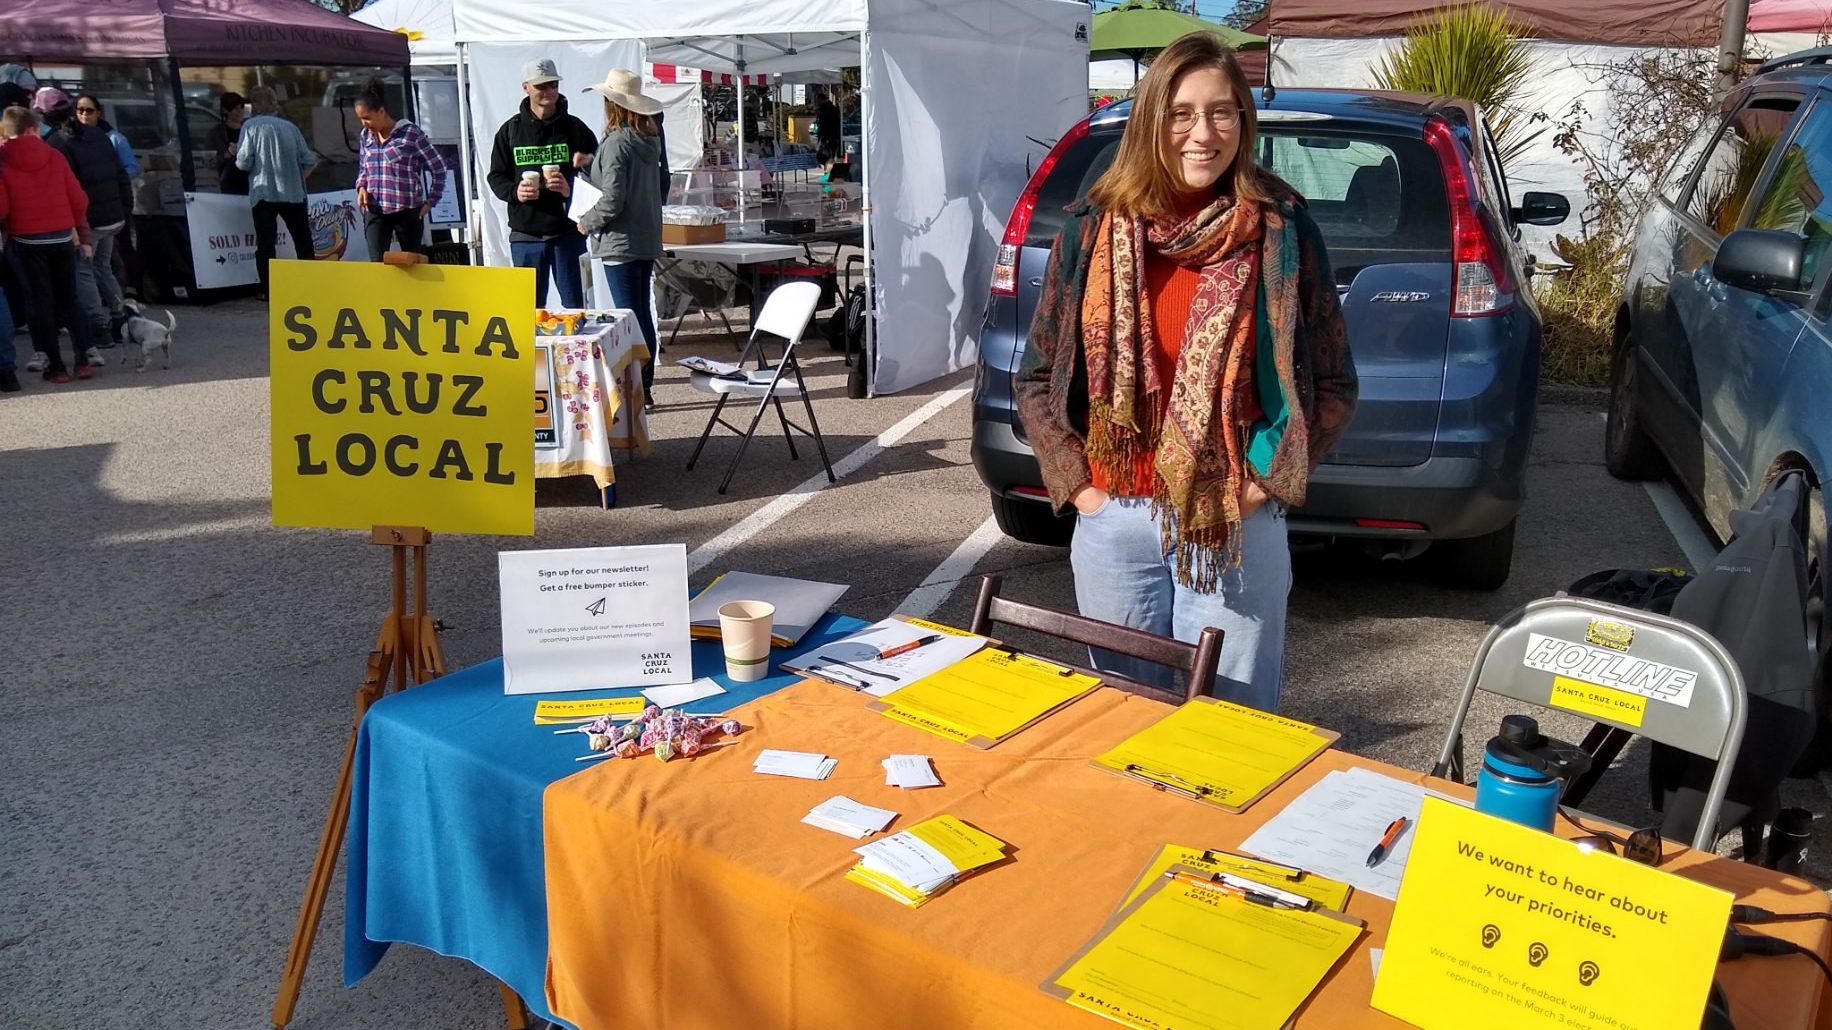 Natalya Dreszer at the Santa Cruz Local table at the Live Oak Farmers Market